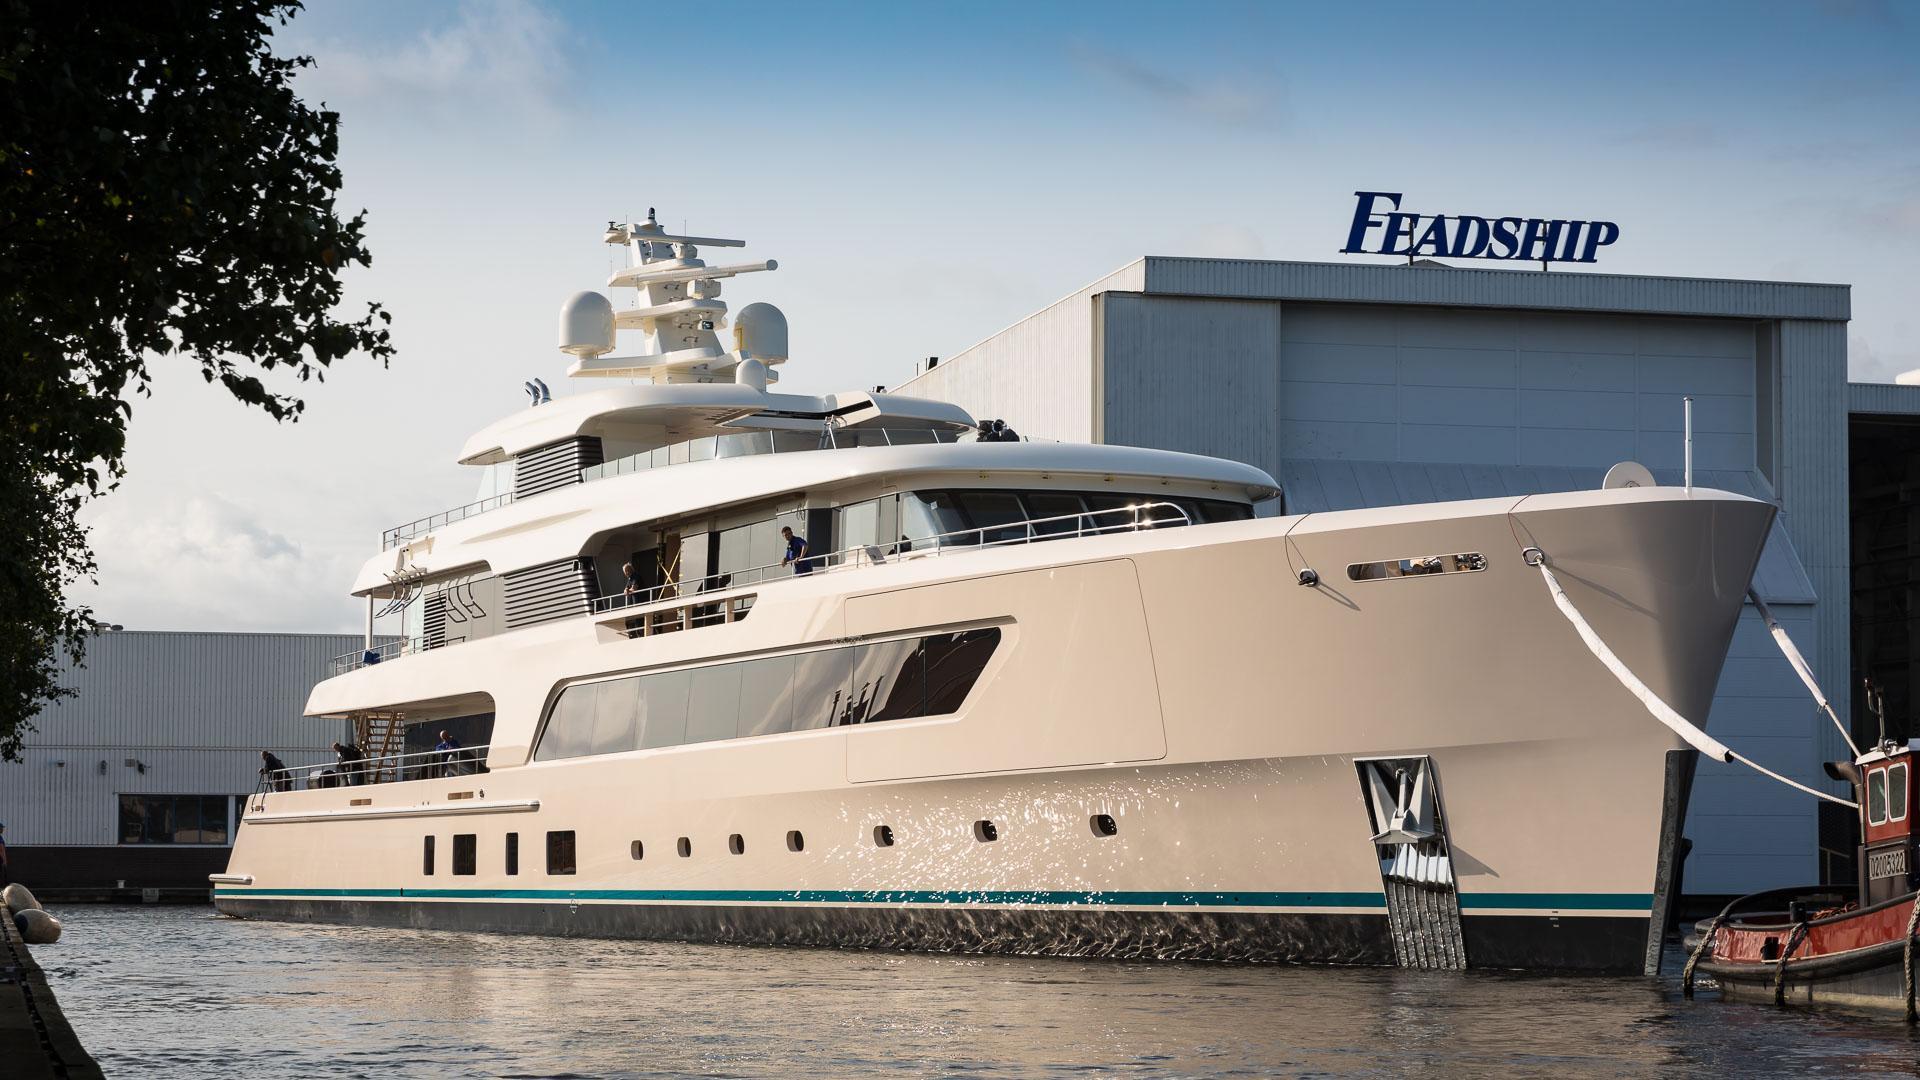 samaya hull 696 motoryacht feadship 2017 69m launch half profile